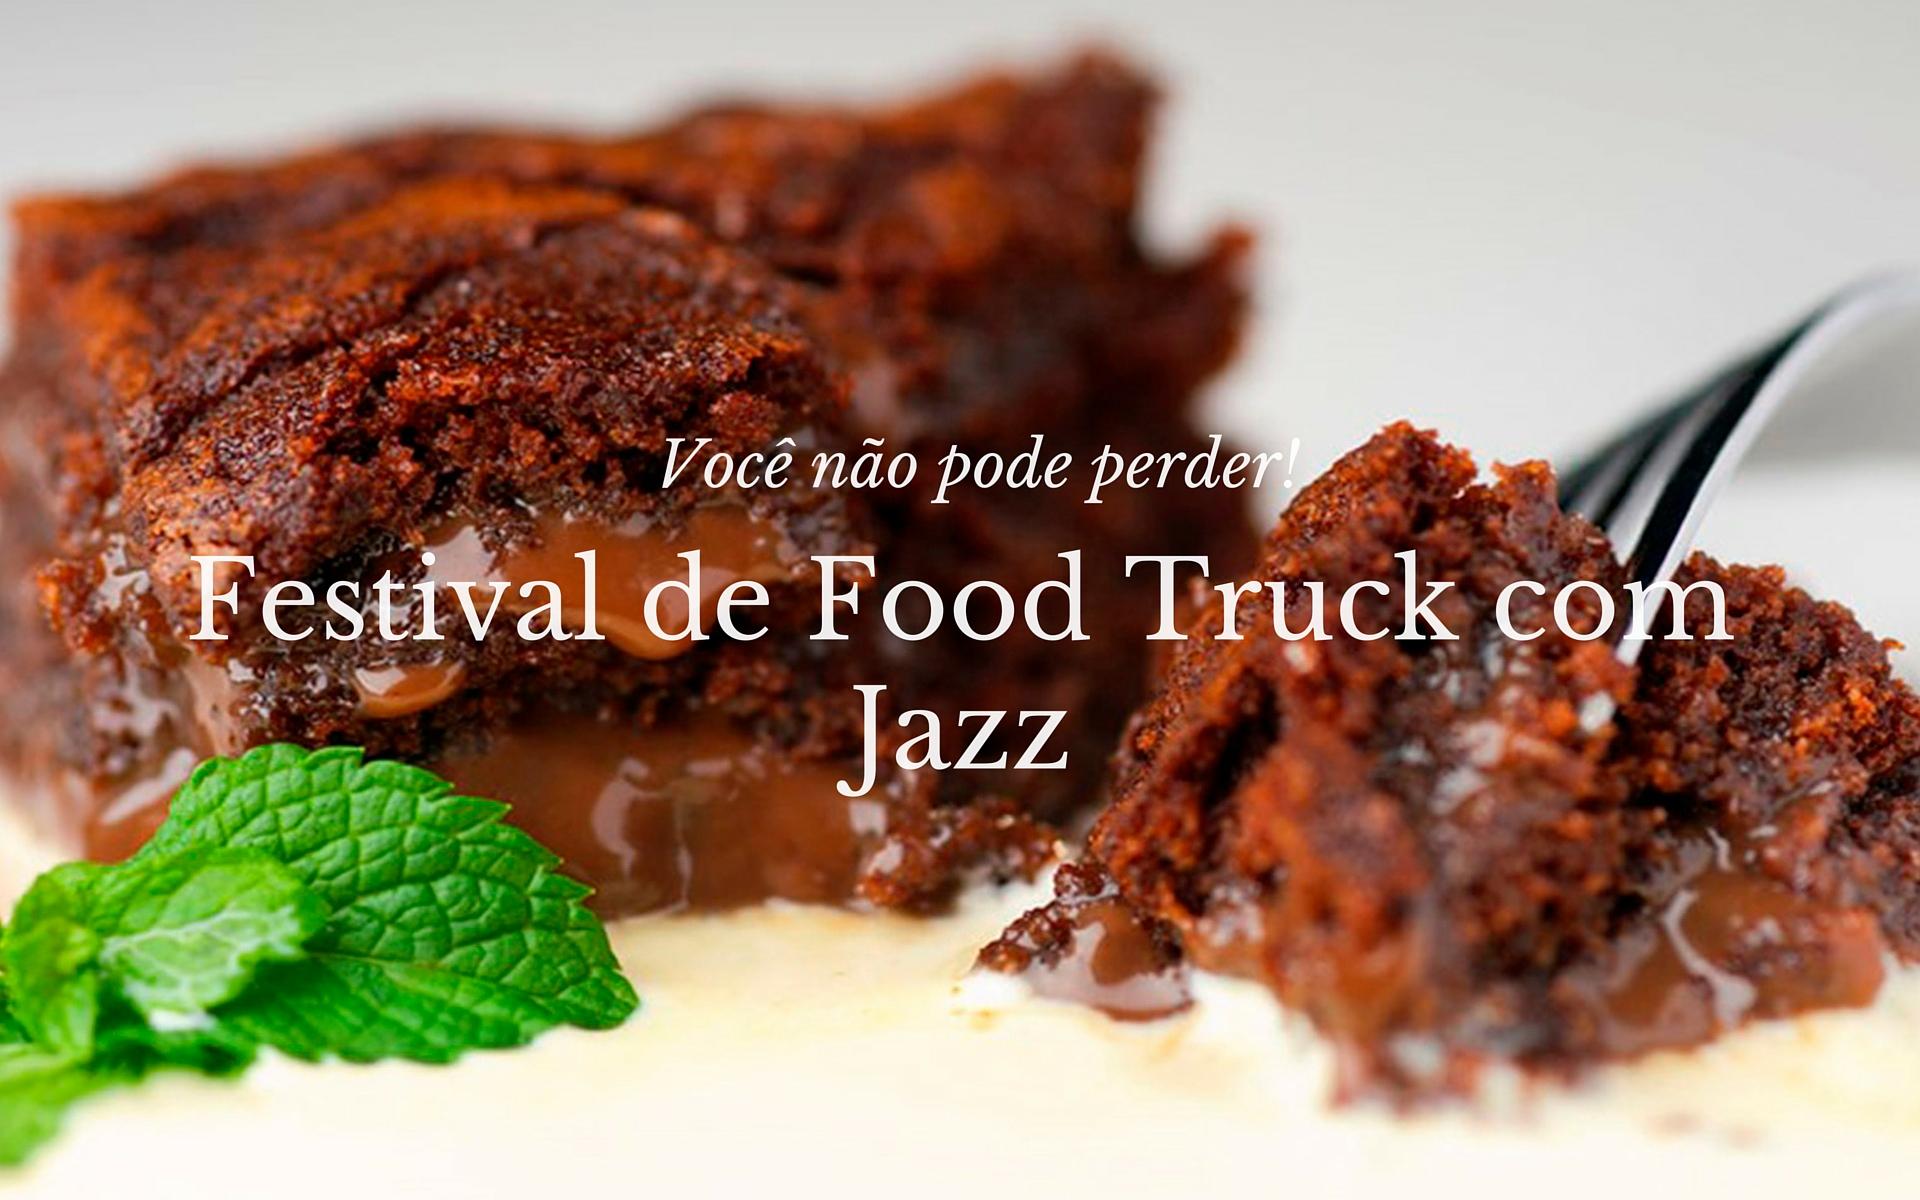 Festival de Food Truck com Jazz